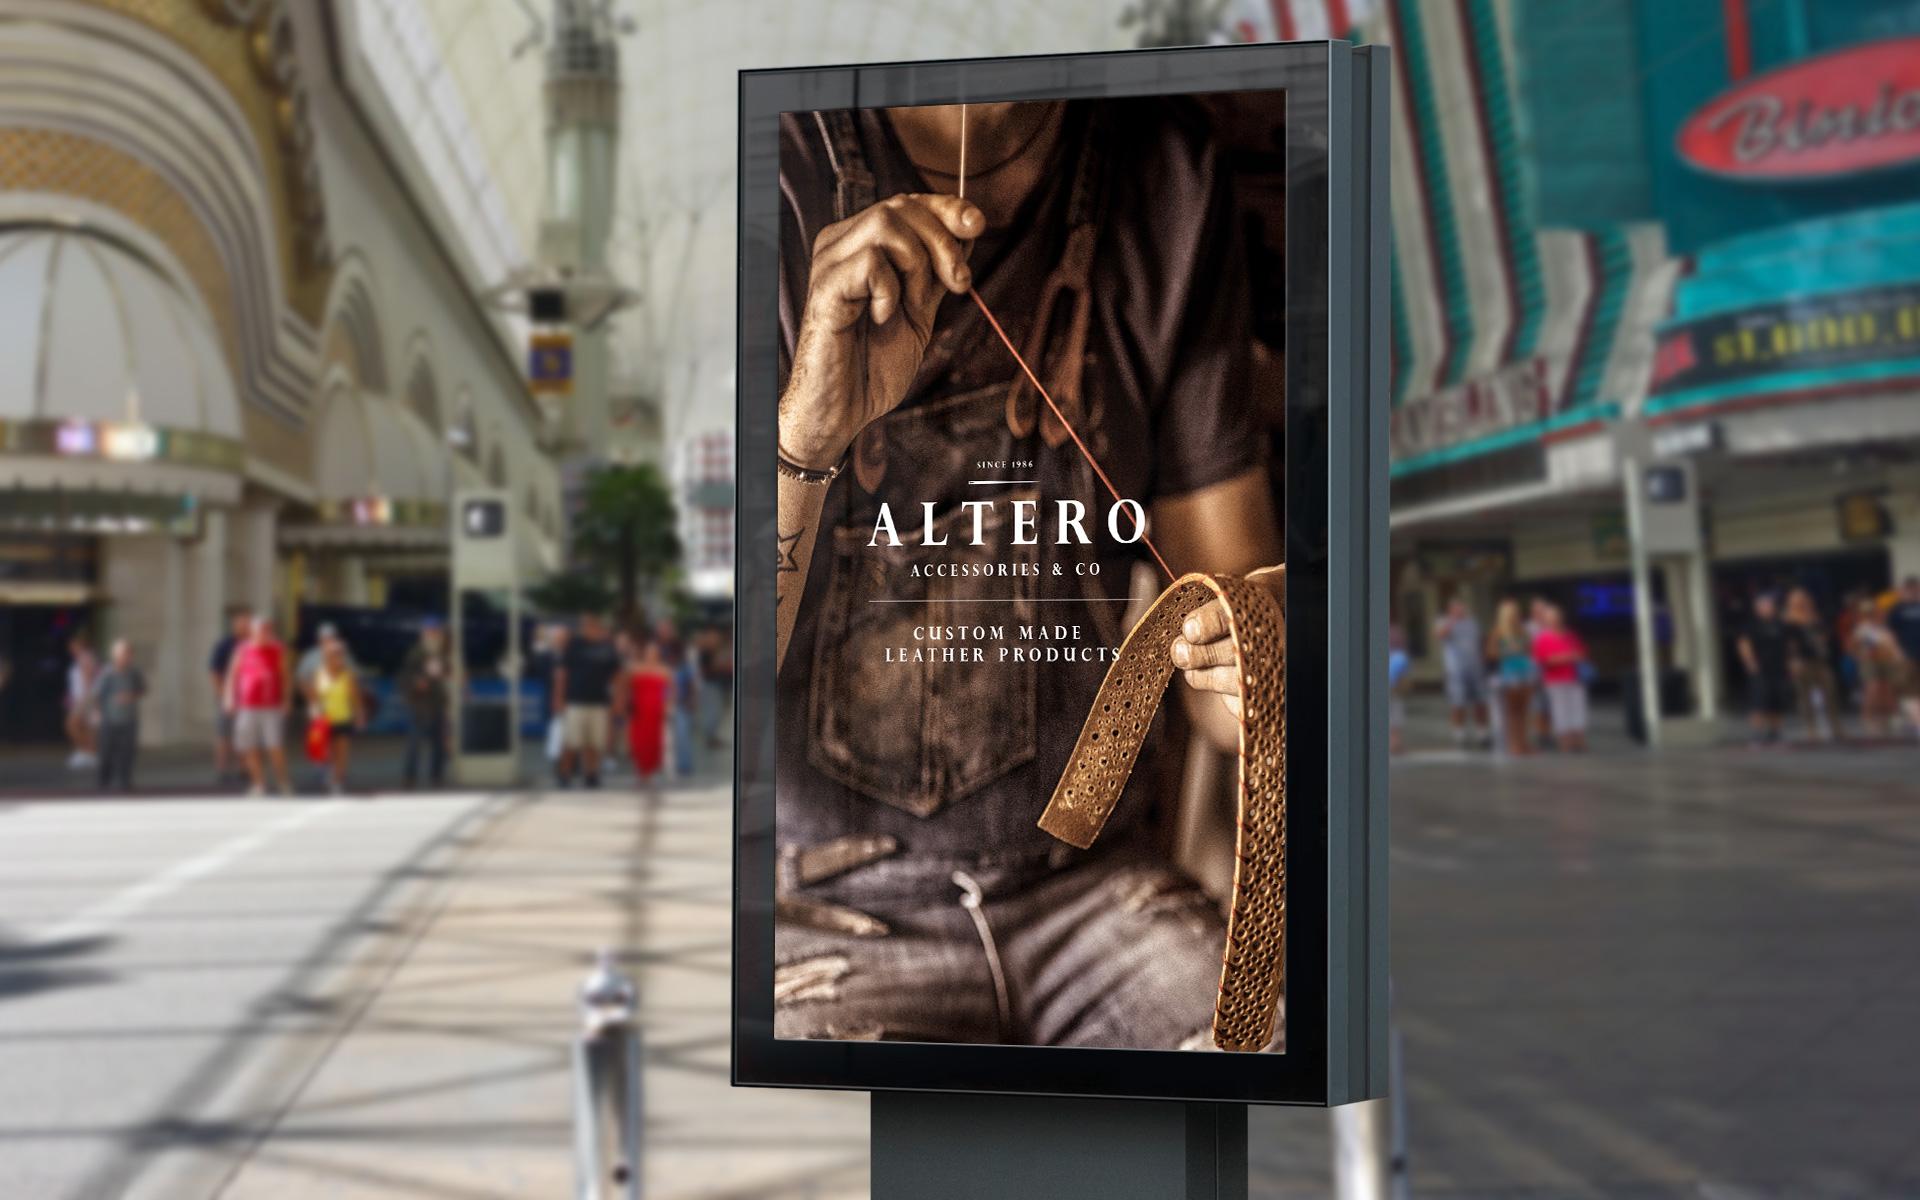 Billboard Altero